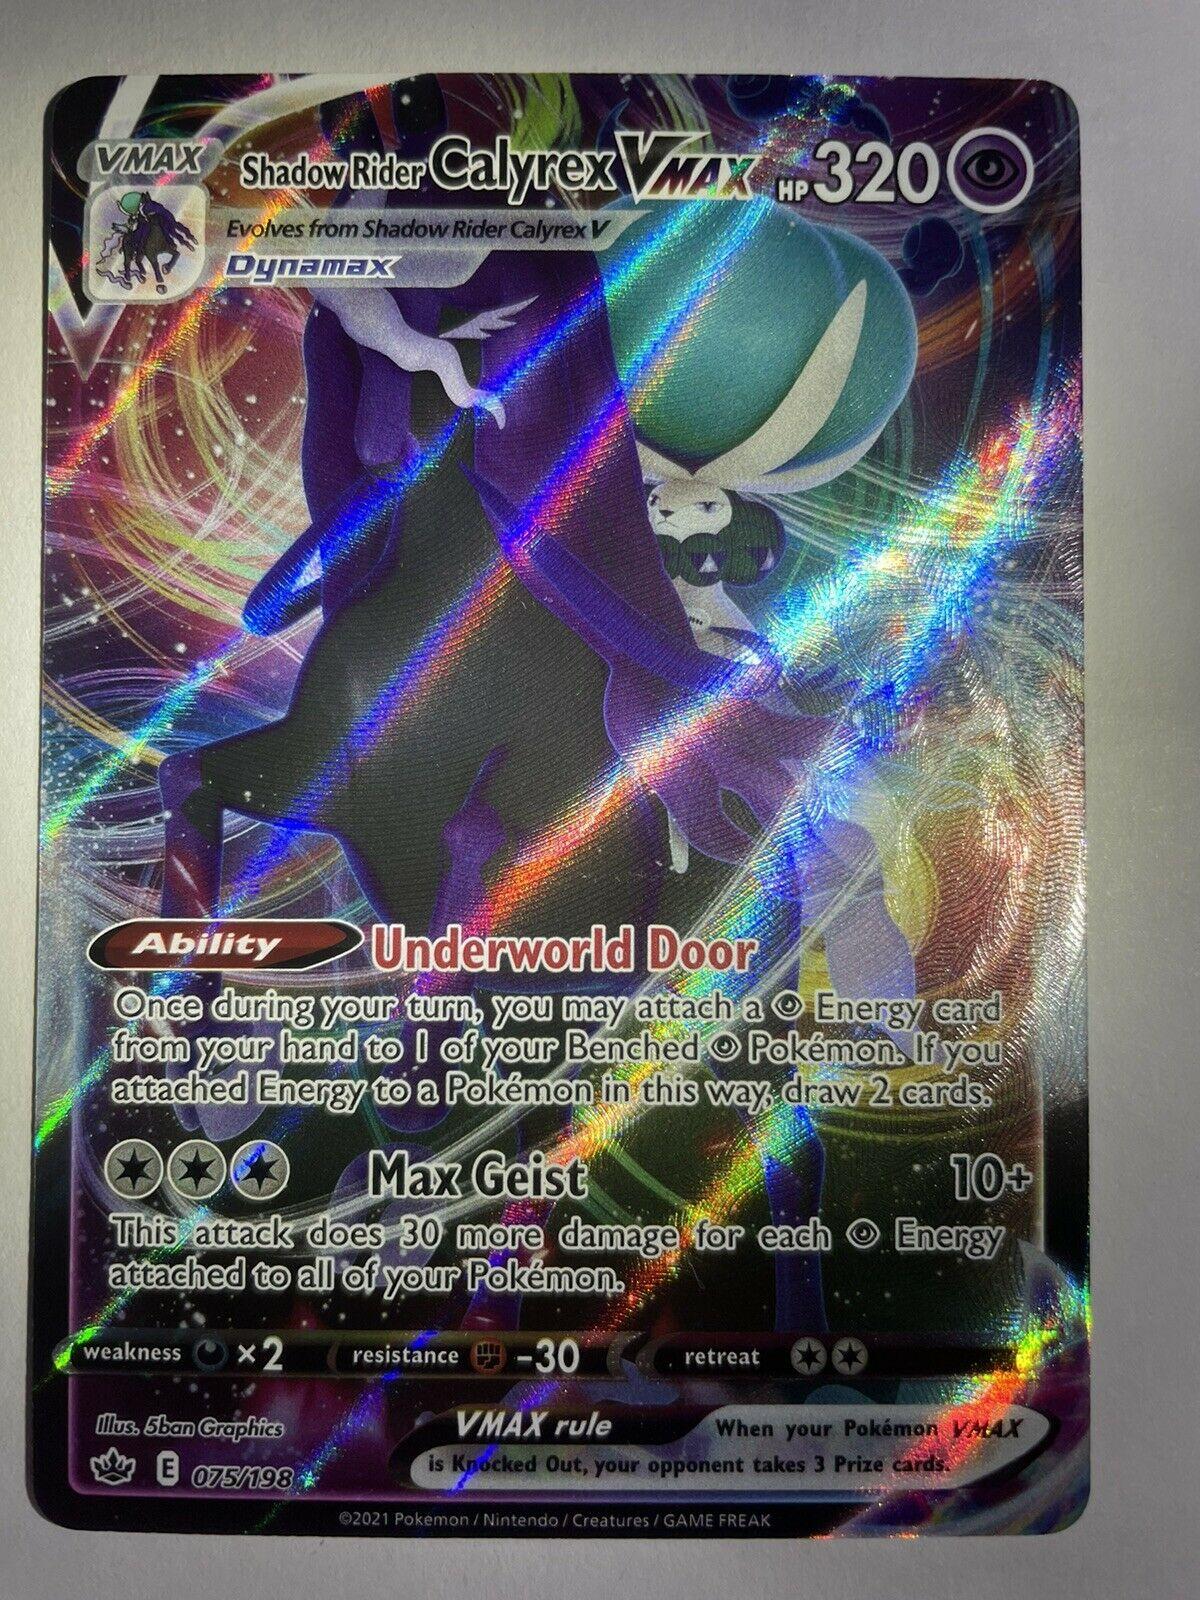 Shadow Rider Calyrex Vmax - 075/198 - Pokemon TCG - Chilling Reign - Fresh Pull